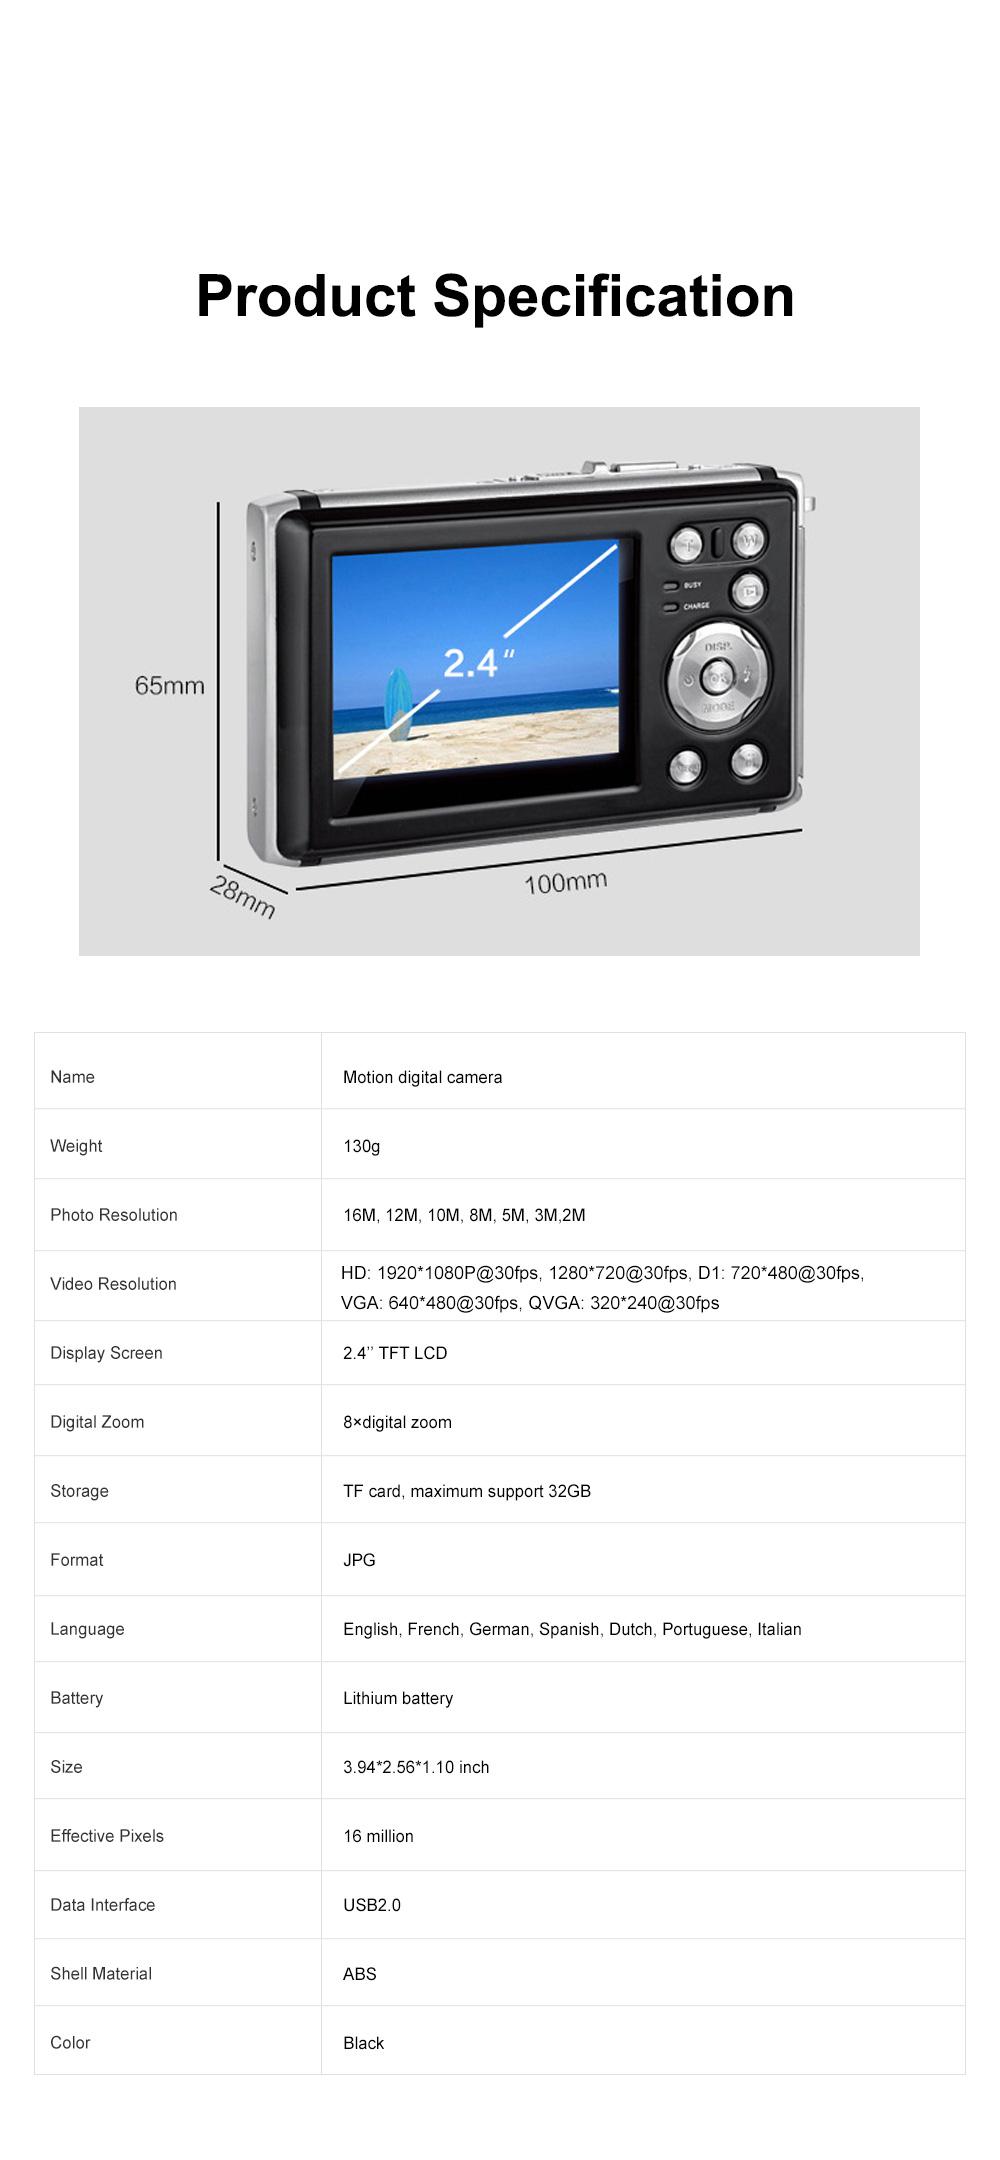 Portable Minimalist HD High Pixel Waterproof Digital Camera Sport Motion Cam with 2.4 Inch Display Screen 6